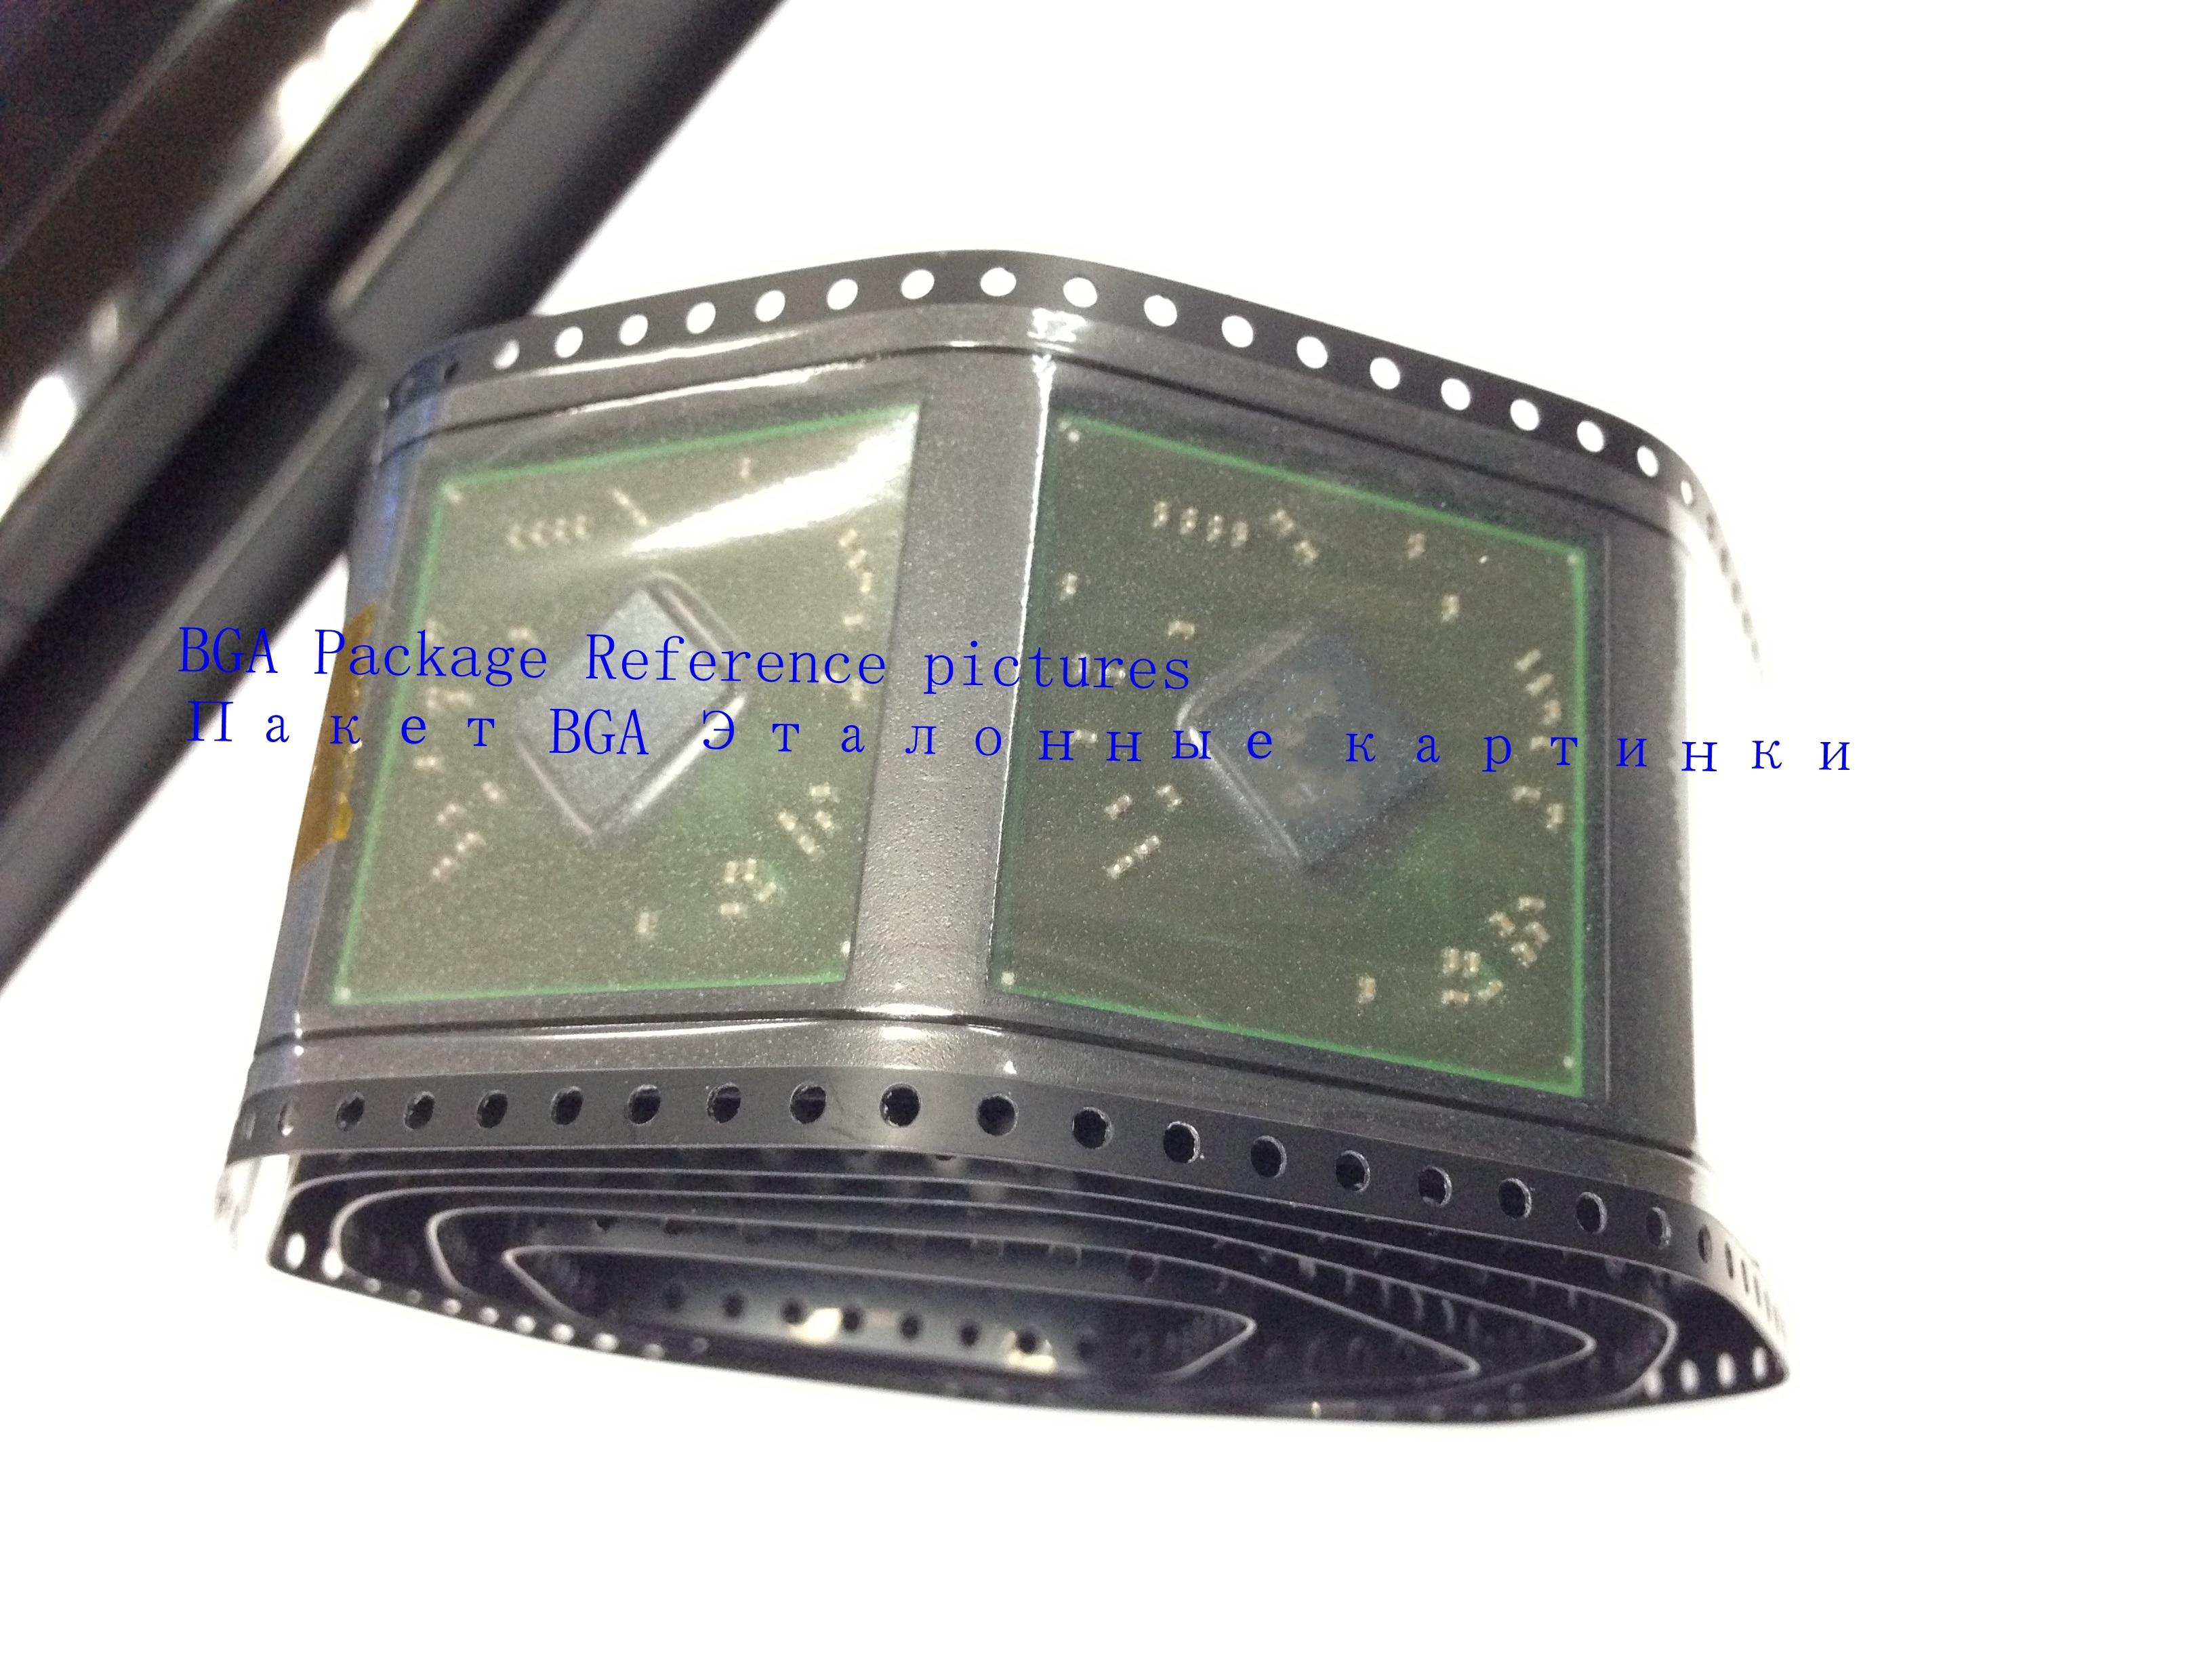 1pcs/lot 100% New BD82H55 SLGZX BGA Chipse1pcs/lot 100% New BD82H55 SLGZX BGA Chipse